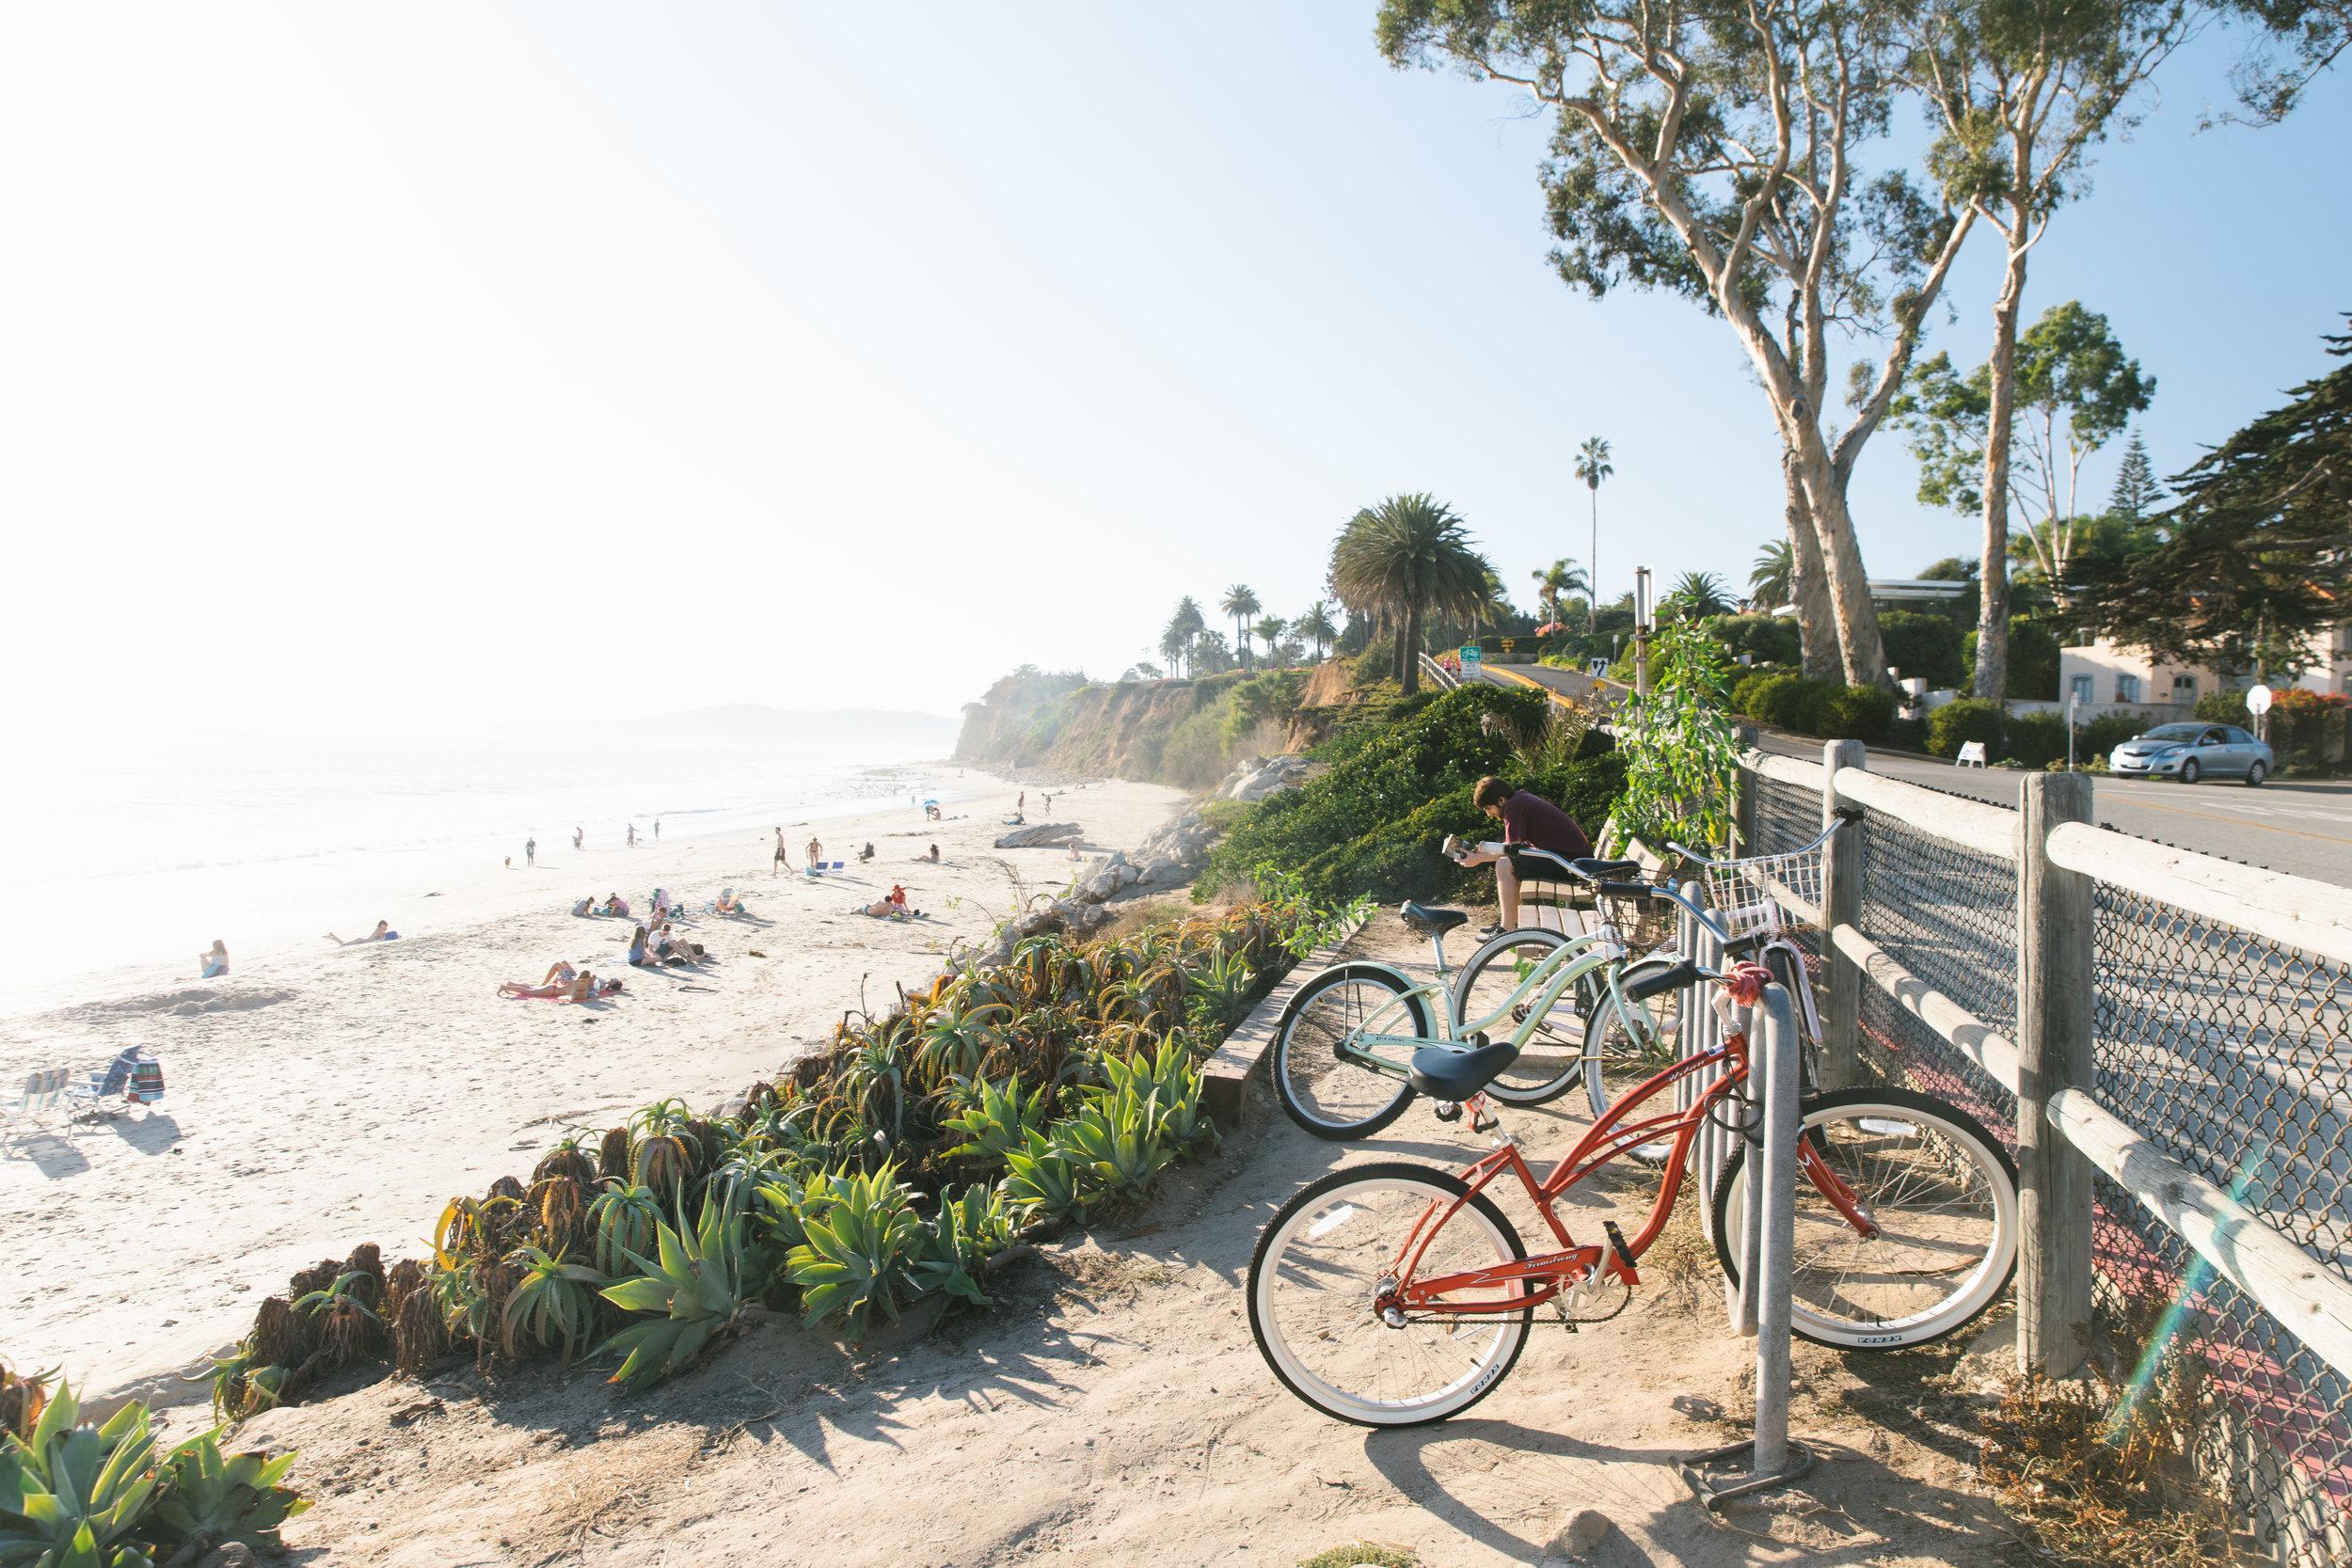 Montecito - Welcome to the neighborhood.